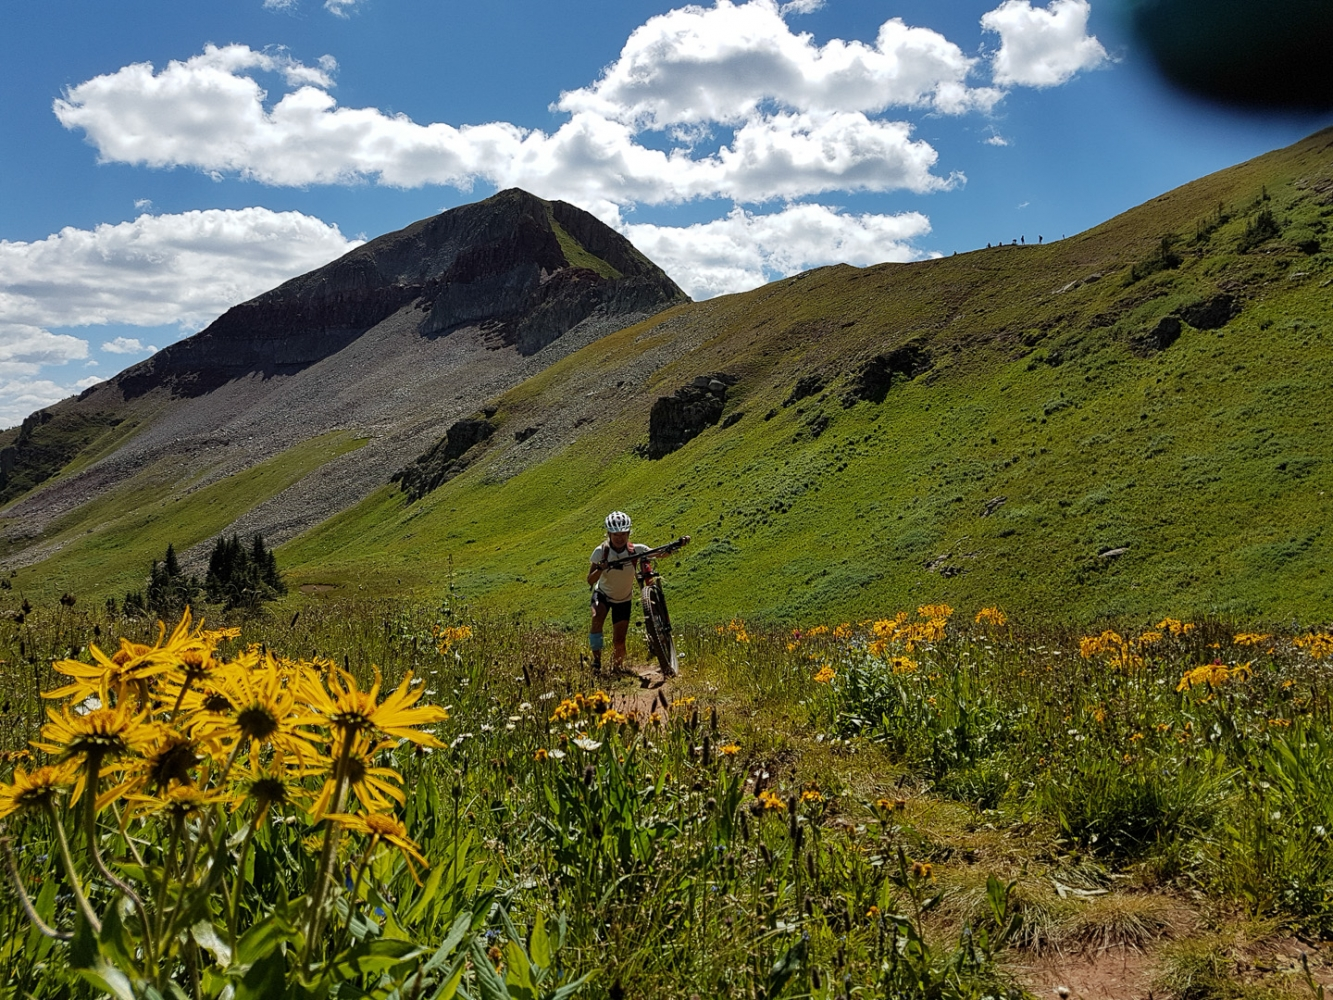 Durango Colorado Trail Photo Gallery Rim Tours